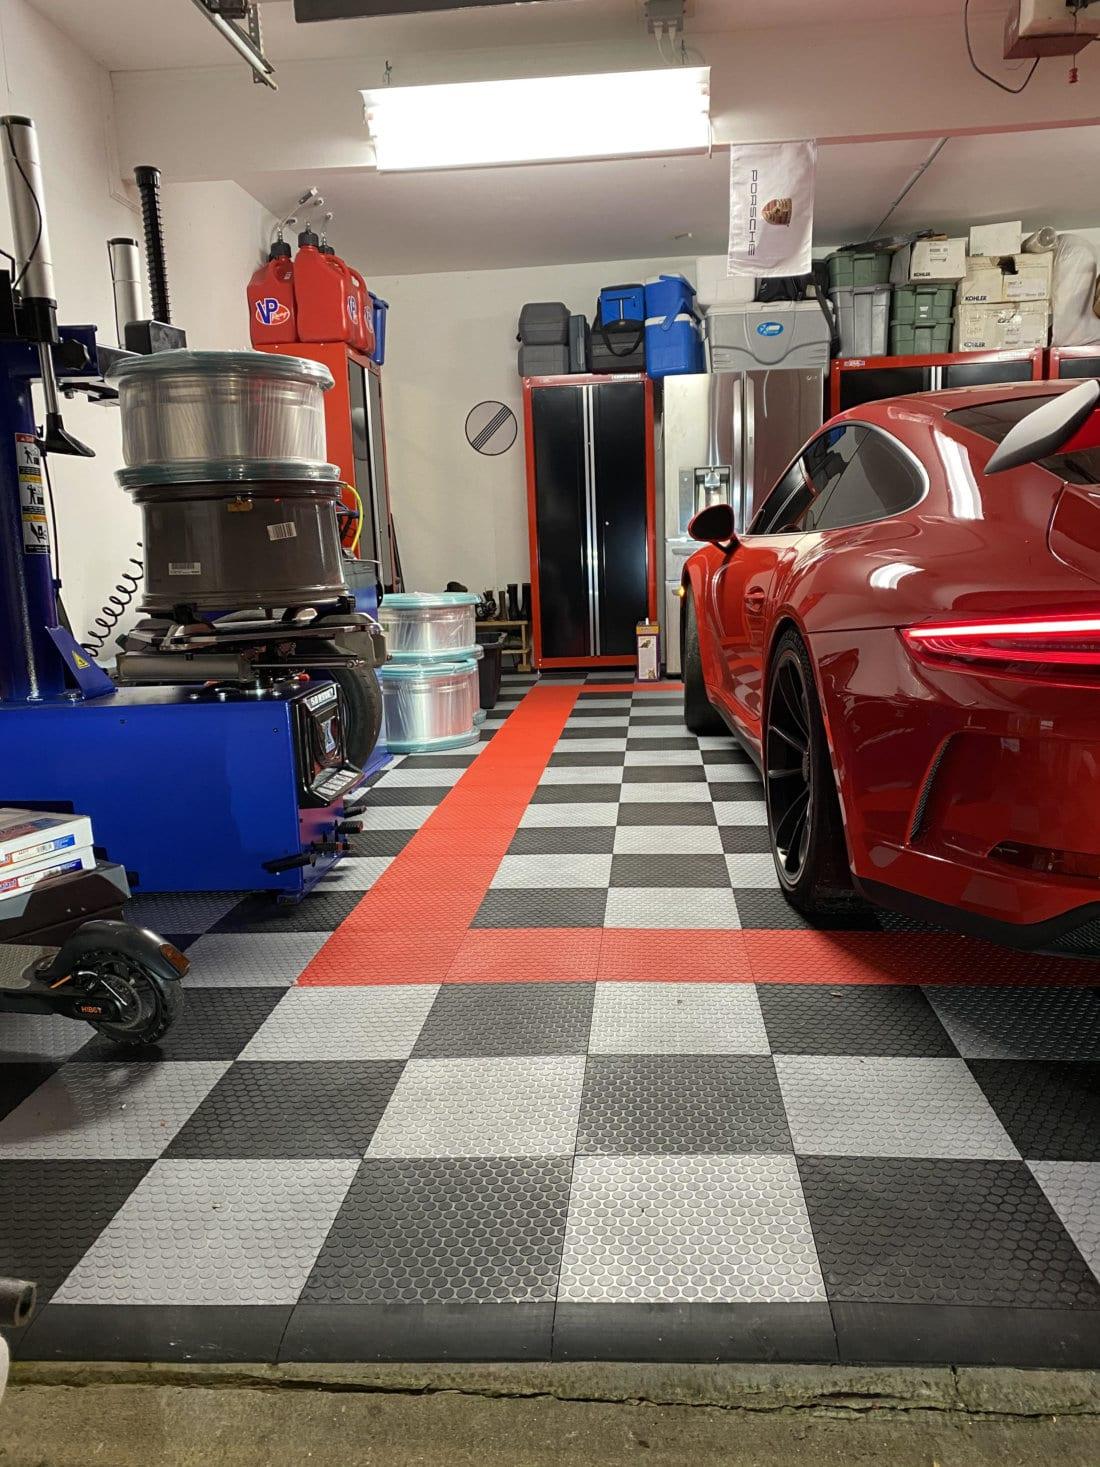 TrueLock HDXT Small Coin Garage With Red Ferrari